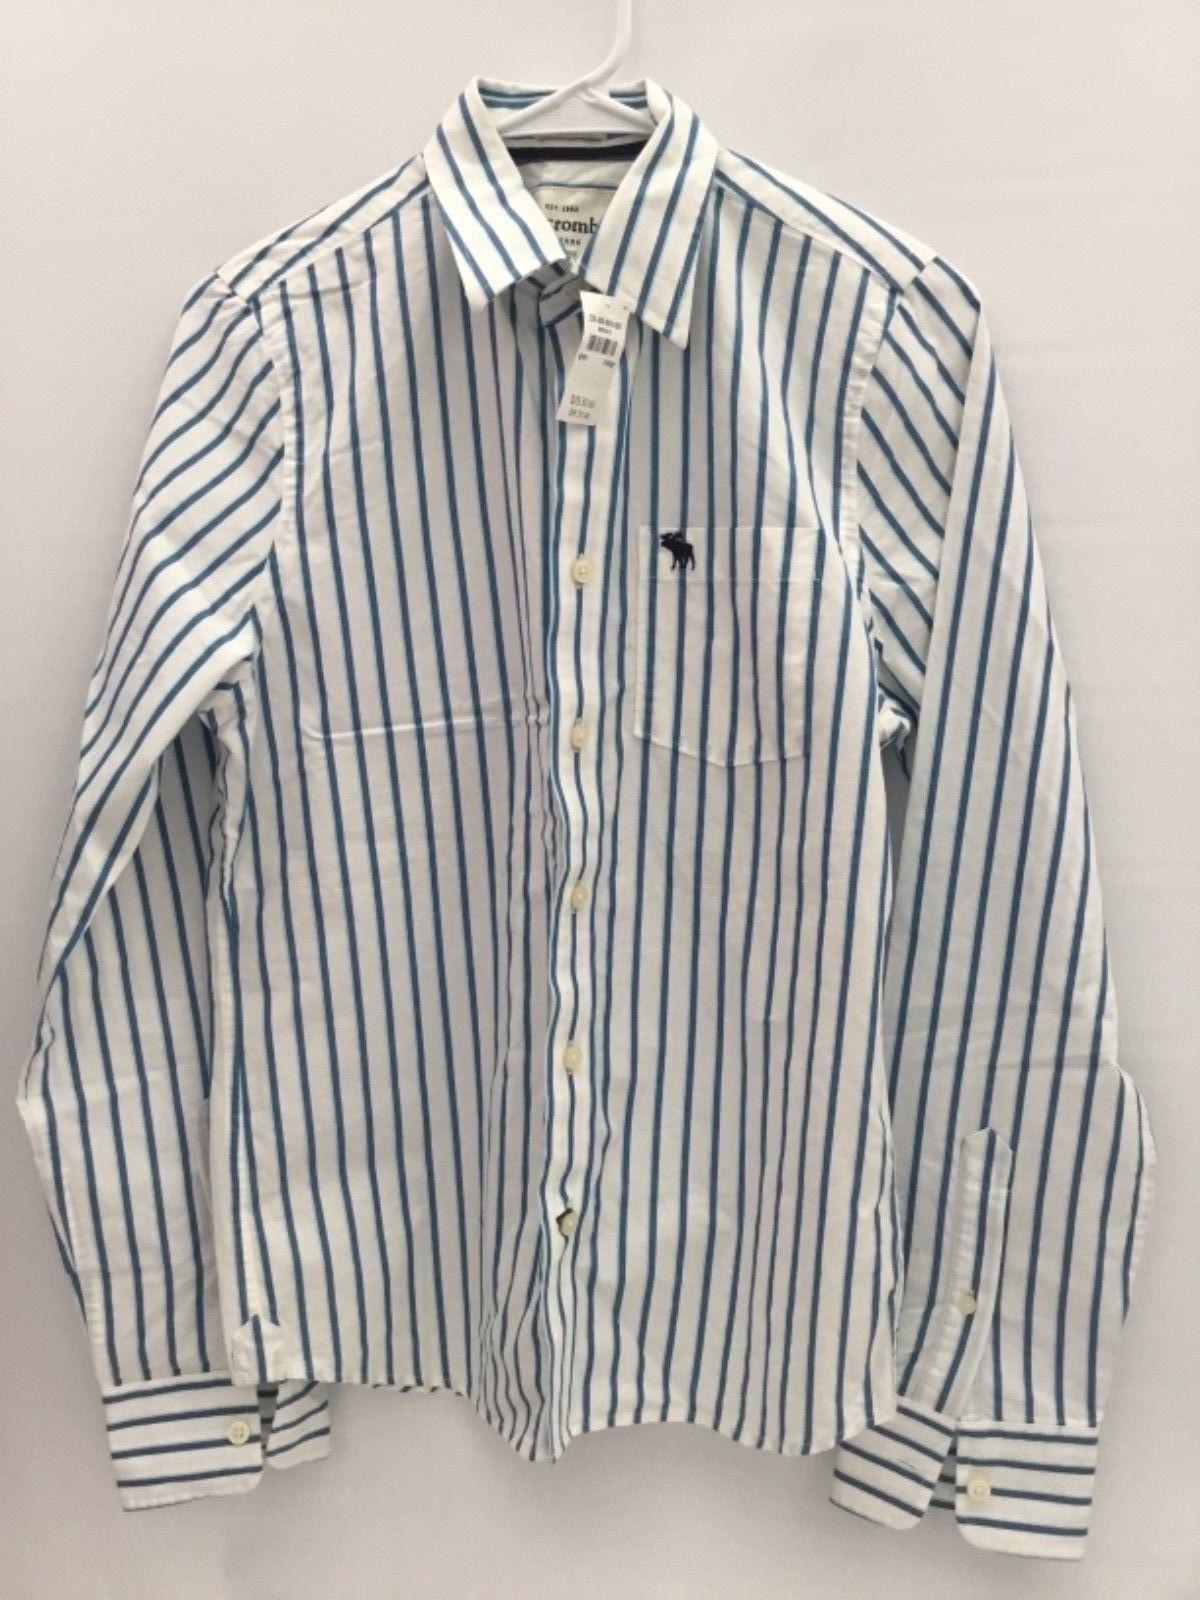 cbc443761 S l1600. S l1600. Previous. Abercrombie Boys Muscle Long Sleeve Button Up  Shirt Blue/White ...